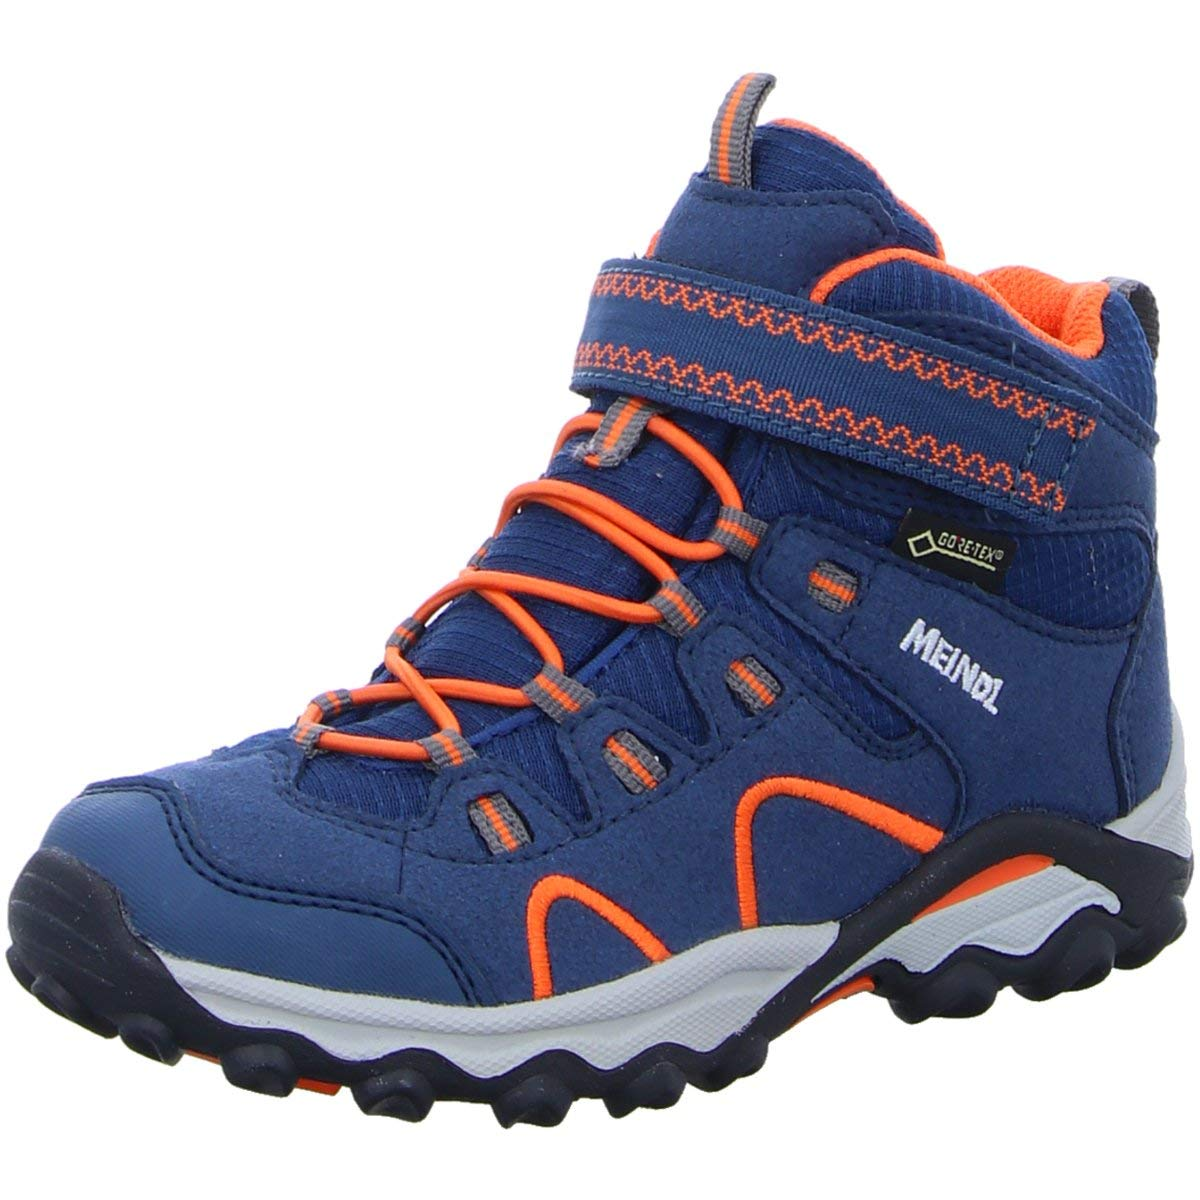 Meindl Kinder Bergschuhe Lucca Junior Mid GTX 2106 049 blau 464718